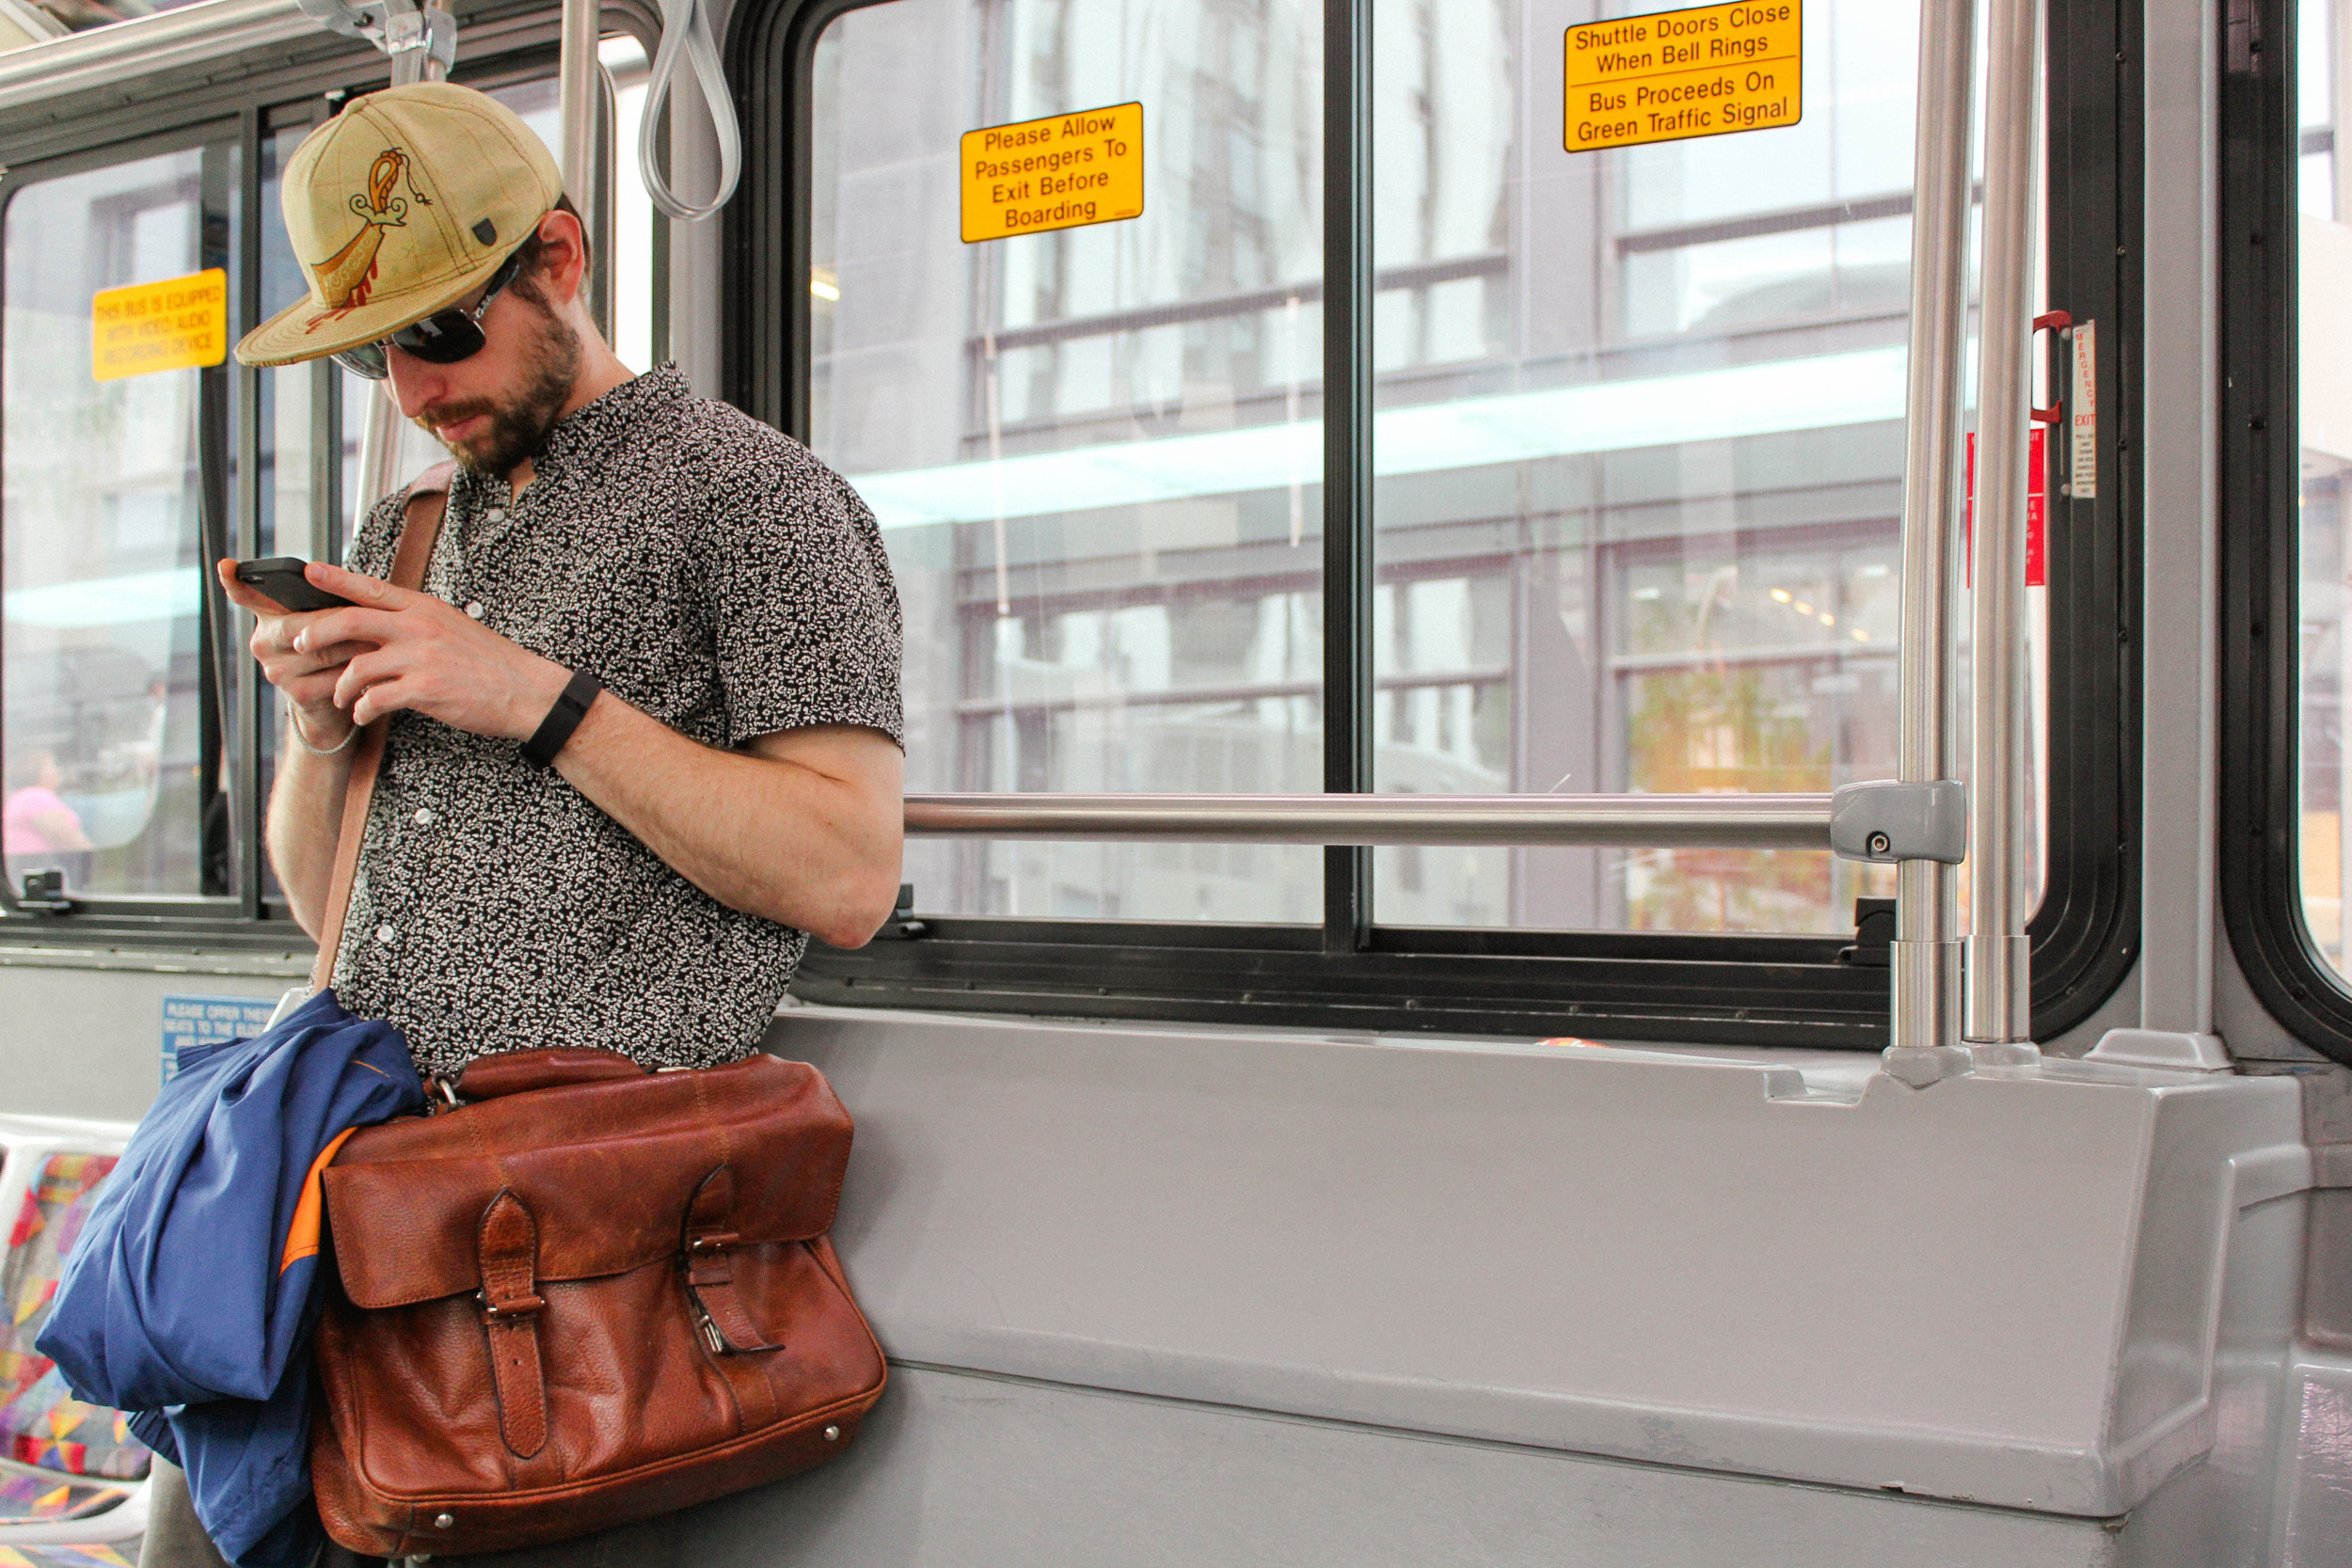 A random stylish man on the bus.